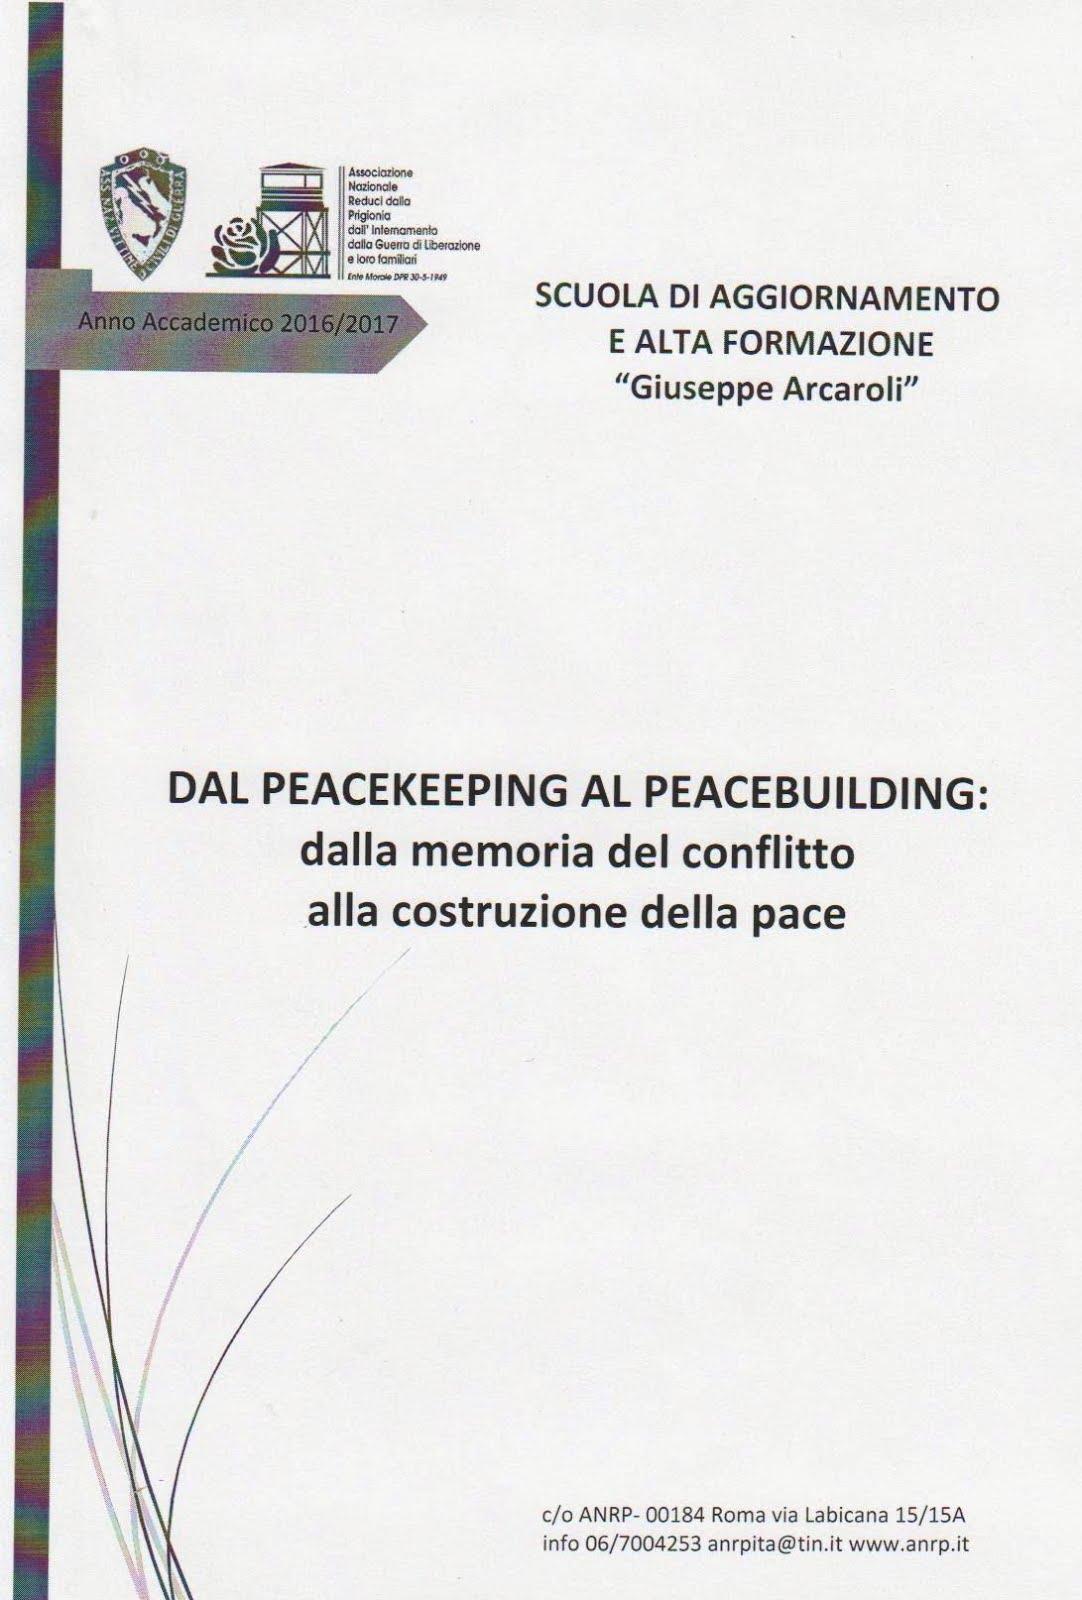 Dal Peacekeeping al Peacebuilding